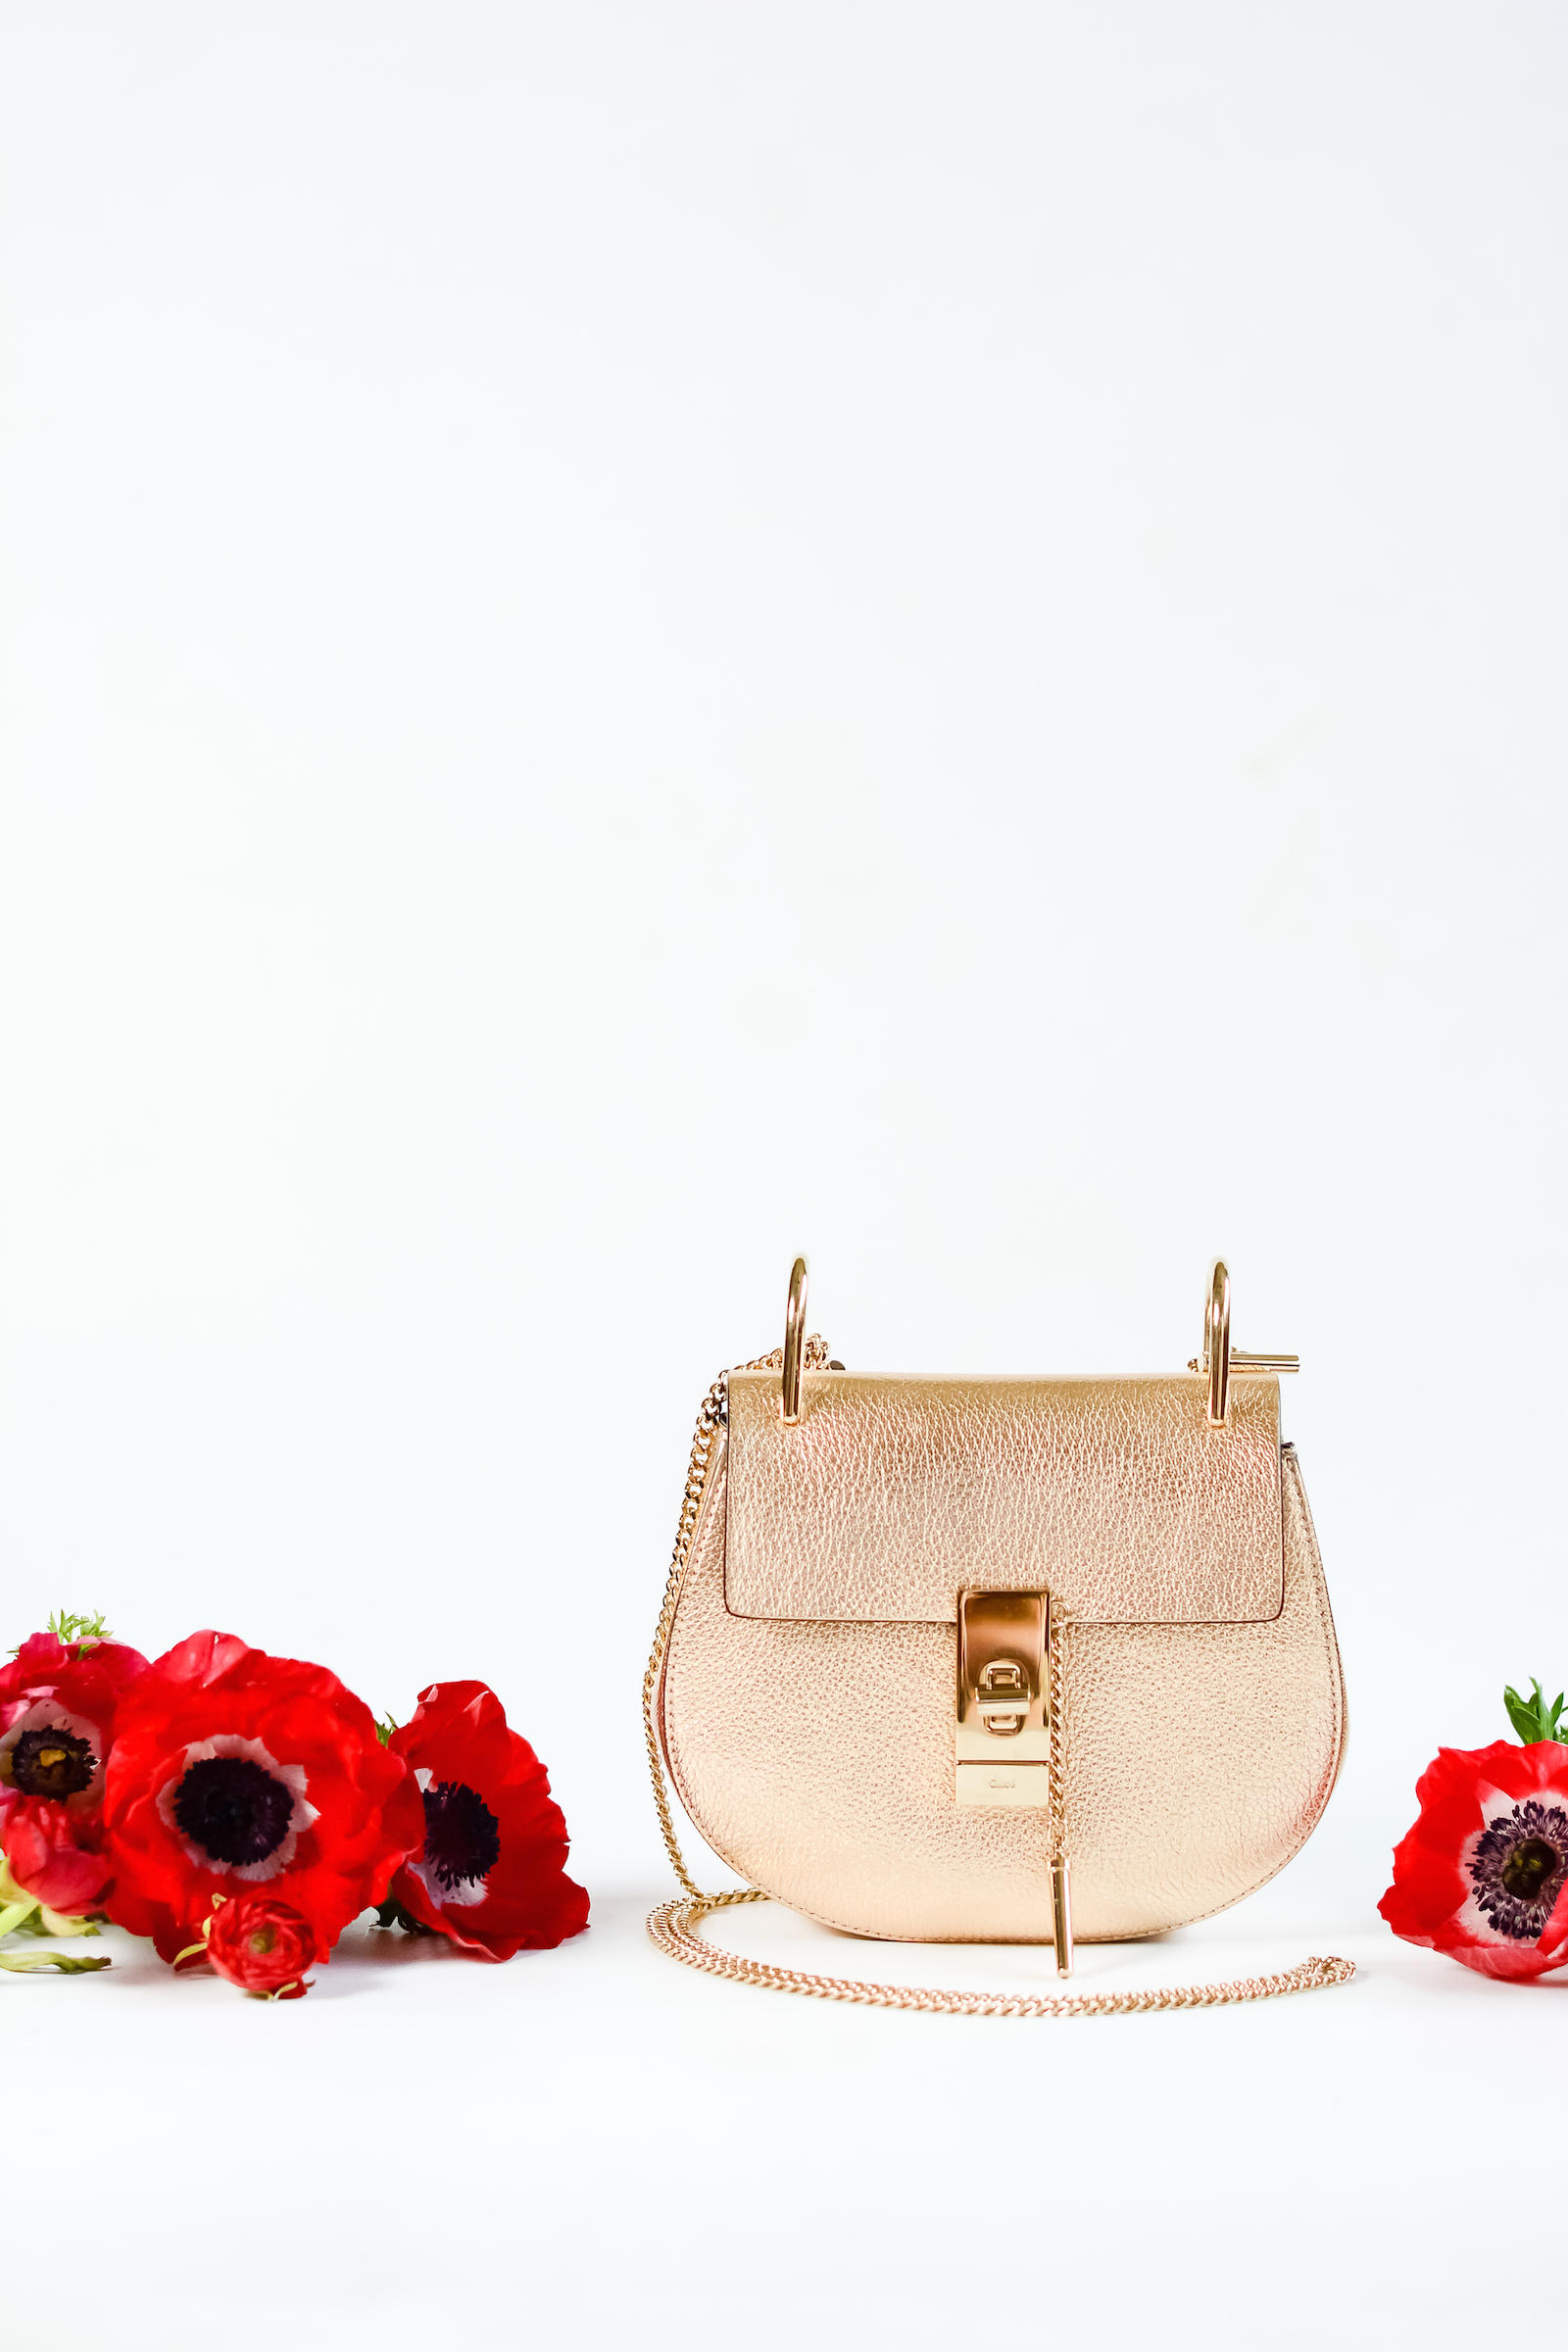 Chloé Mini Drew Bag-38330 NEW